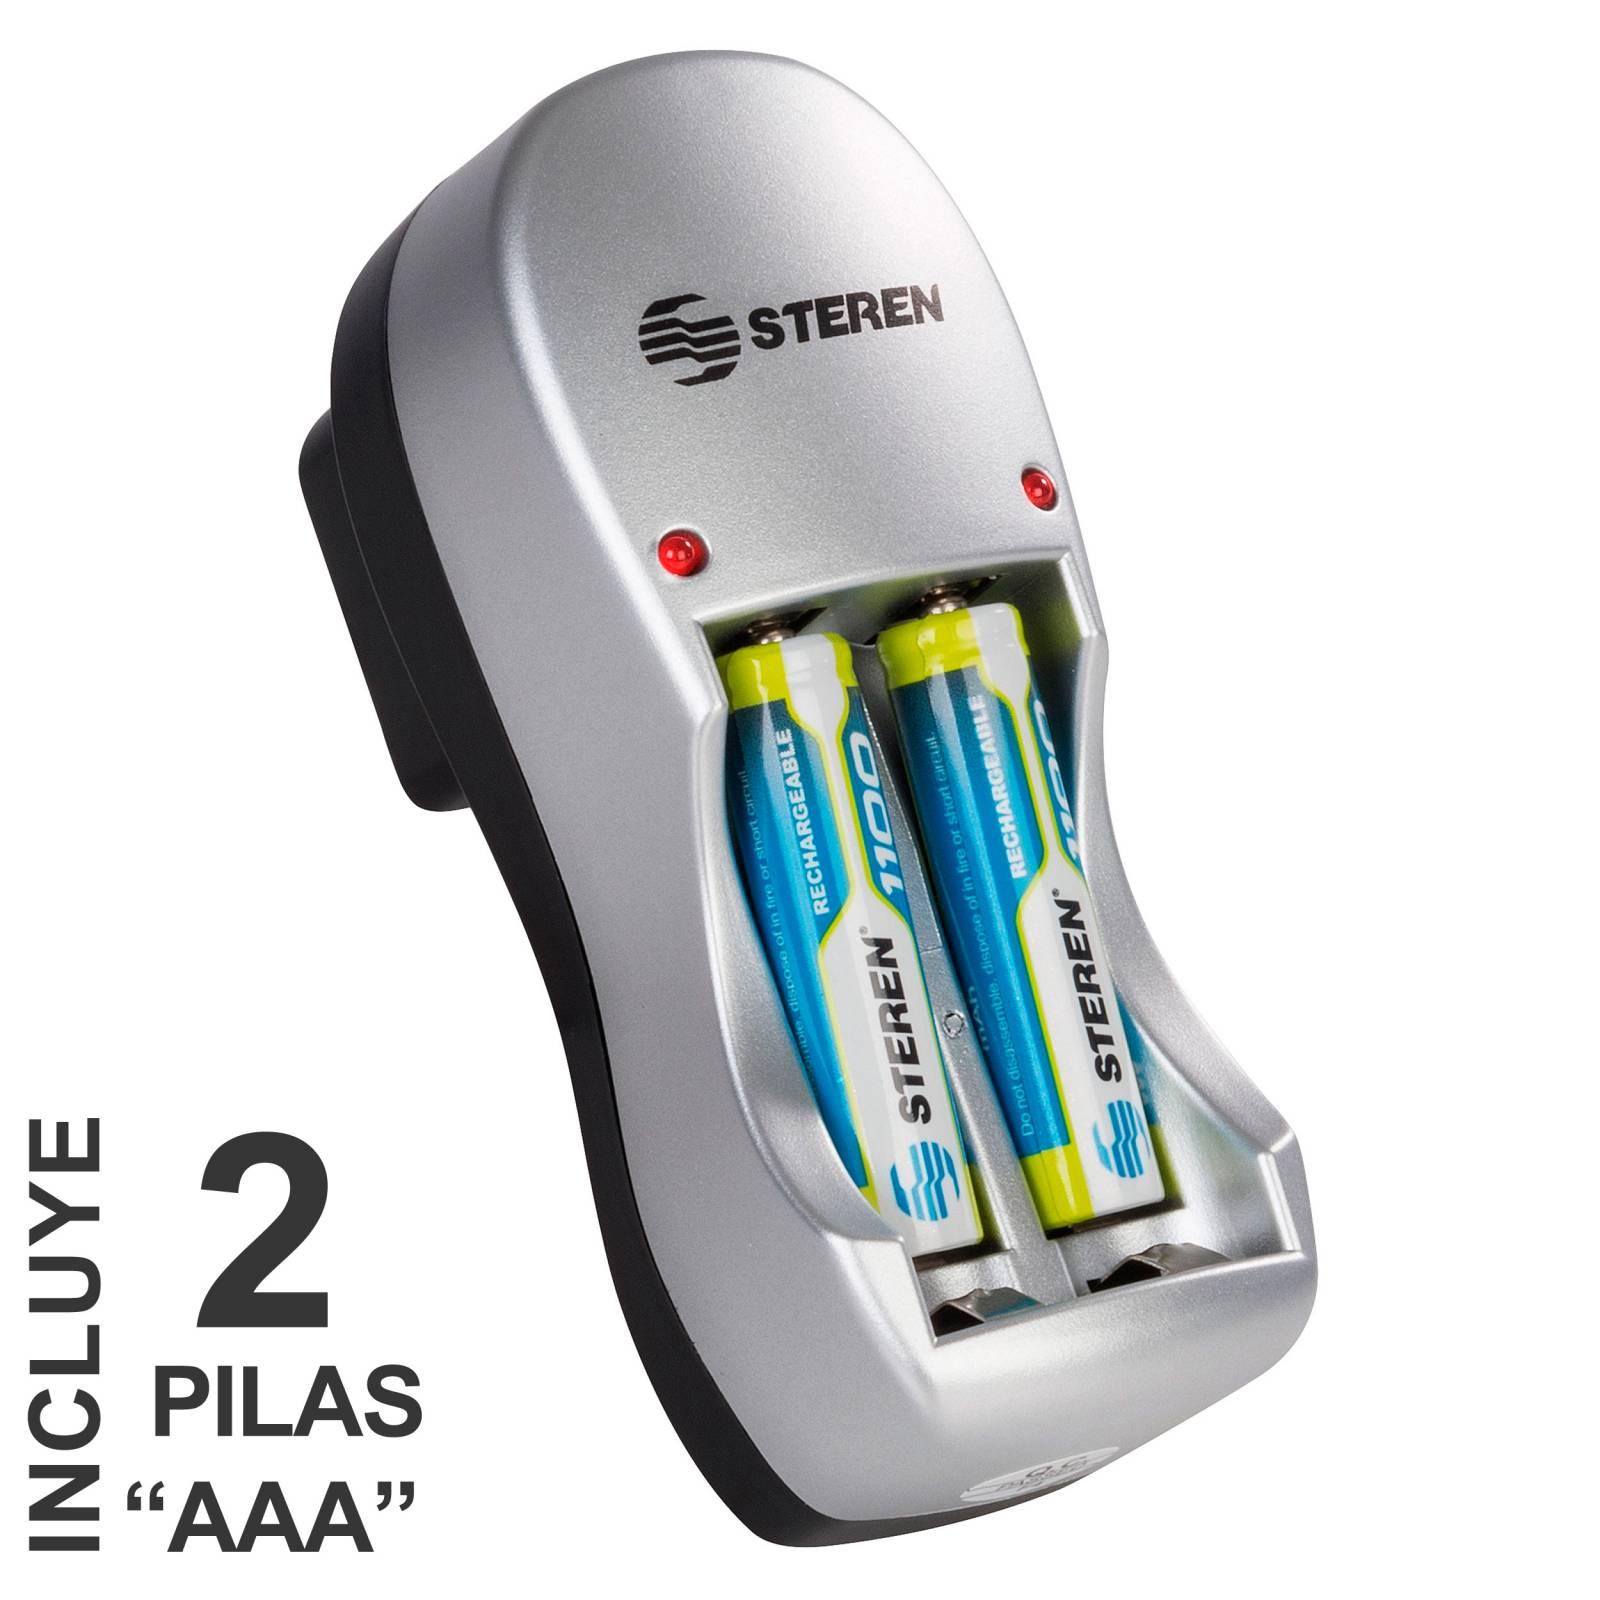 "Mini cargador de pilas ""AA y AAA"". Incluye 2 pilas AAA"